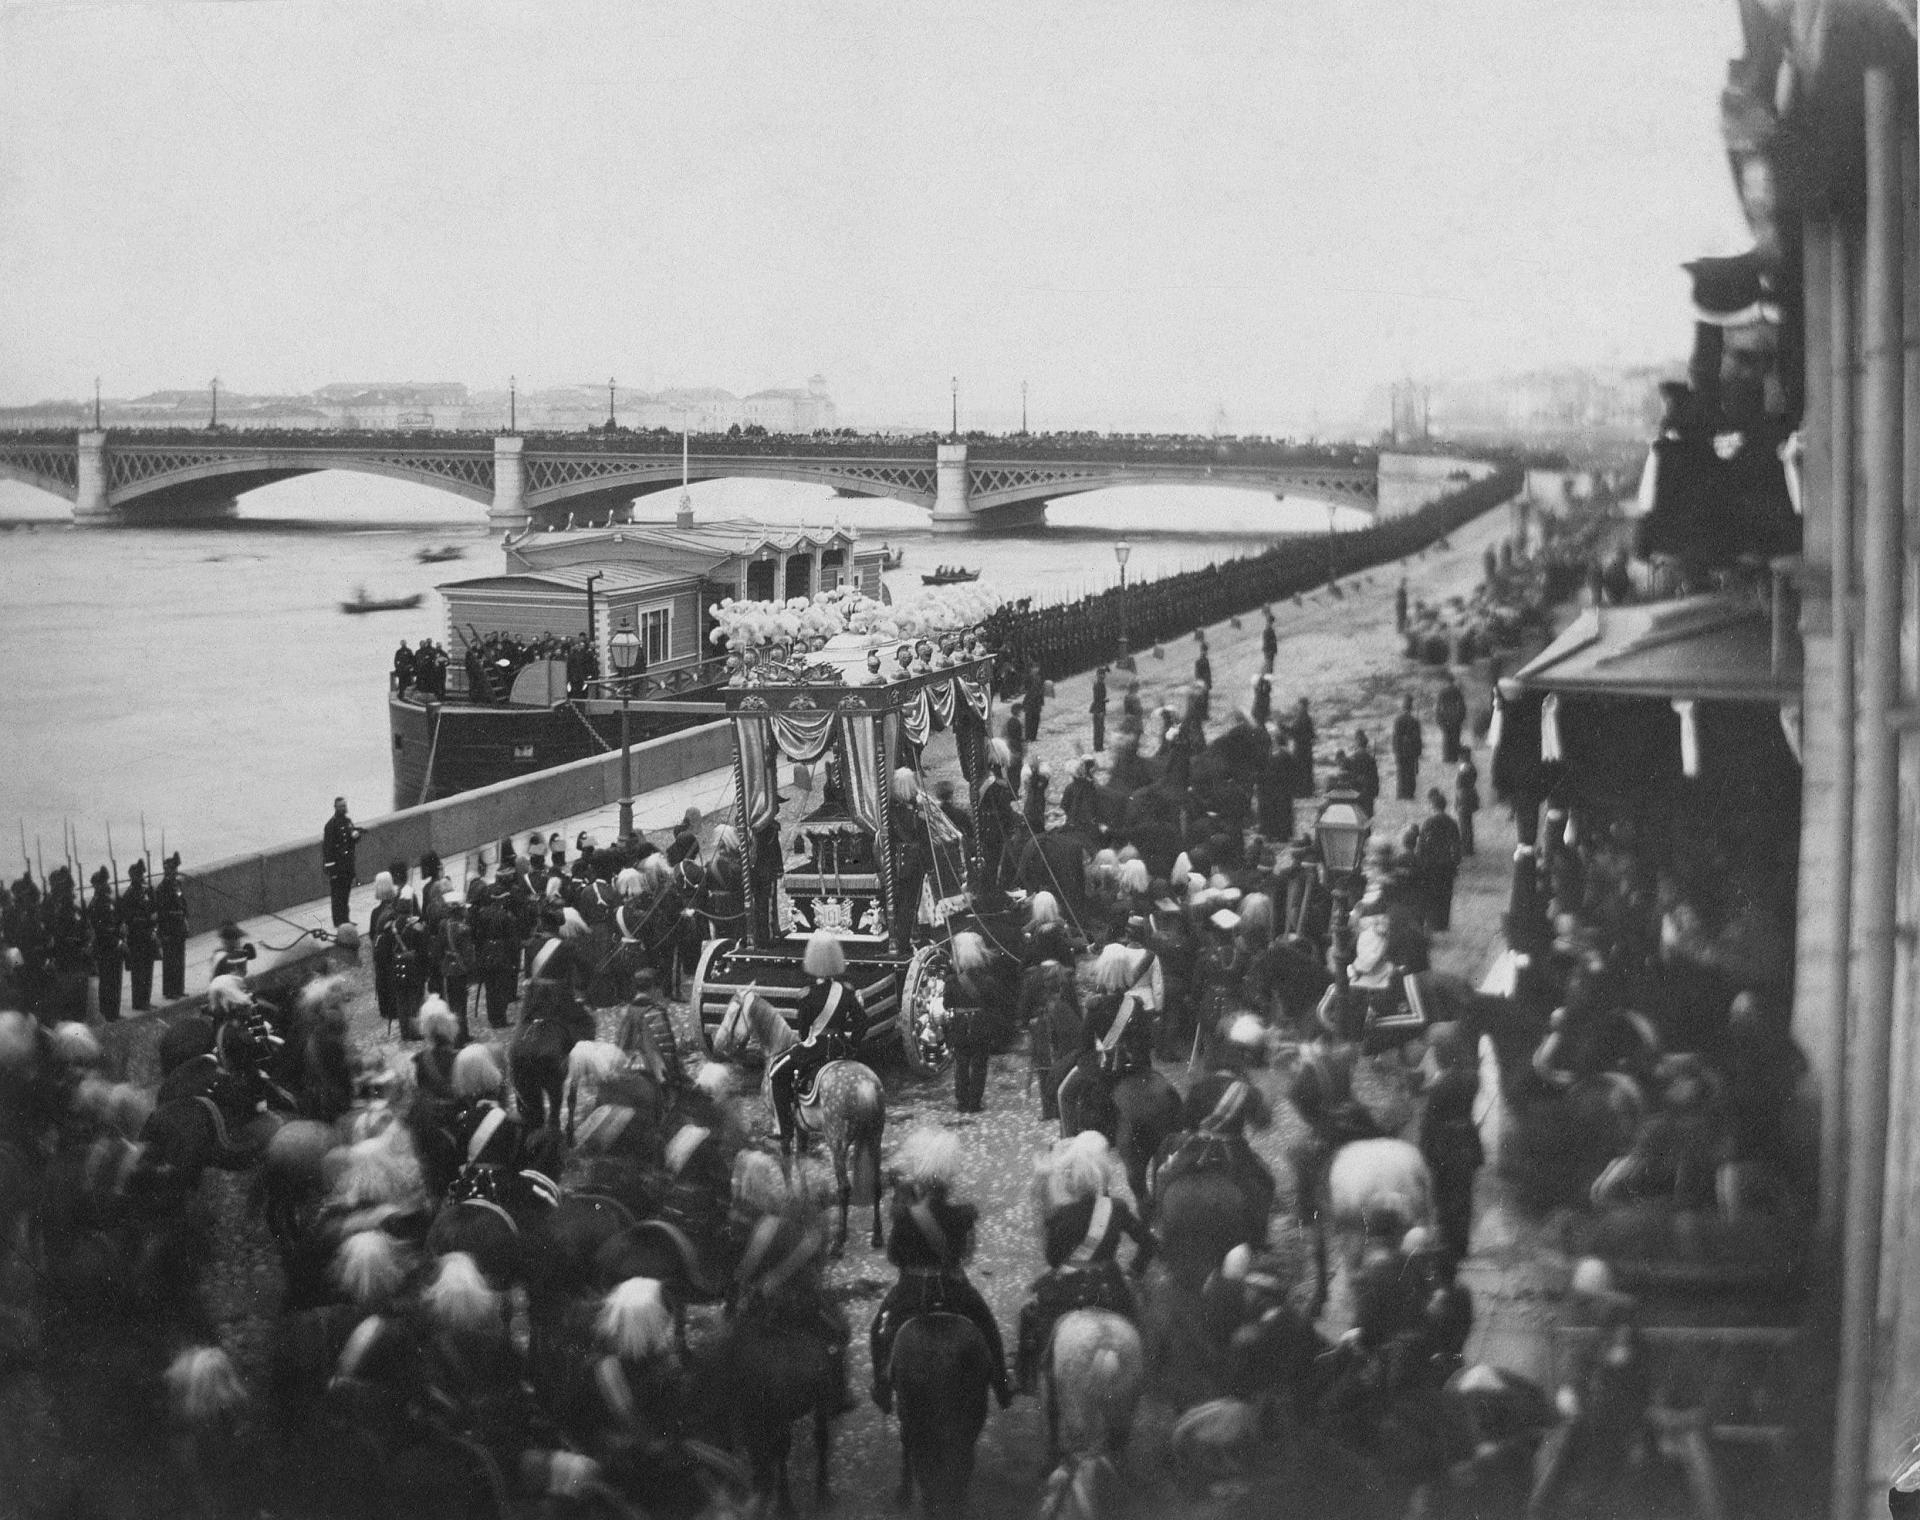 1865. Английская набережная во время перевоза тела цесаревича великого князя Николая Александровича